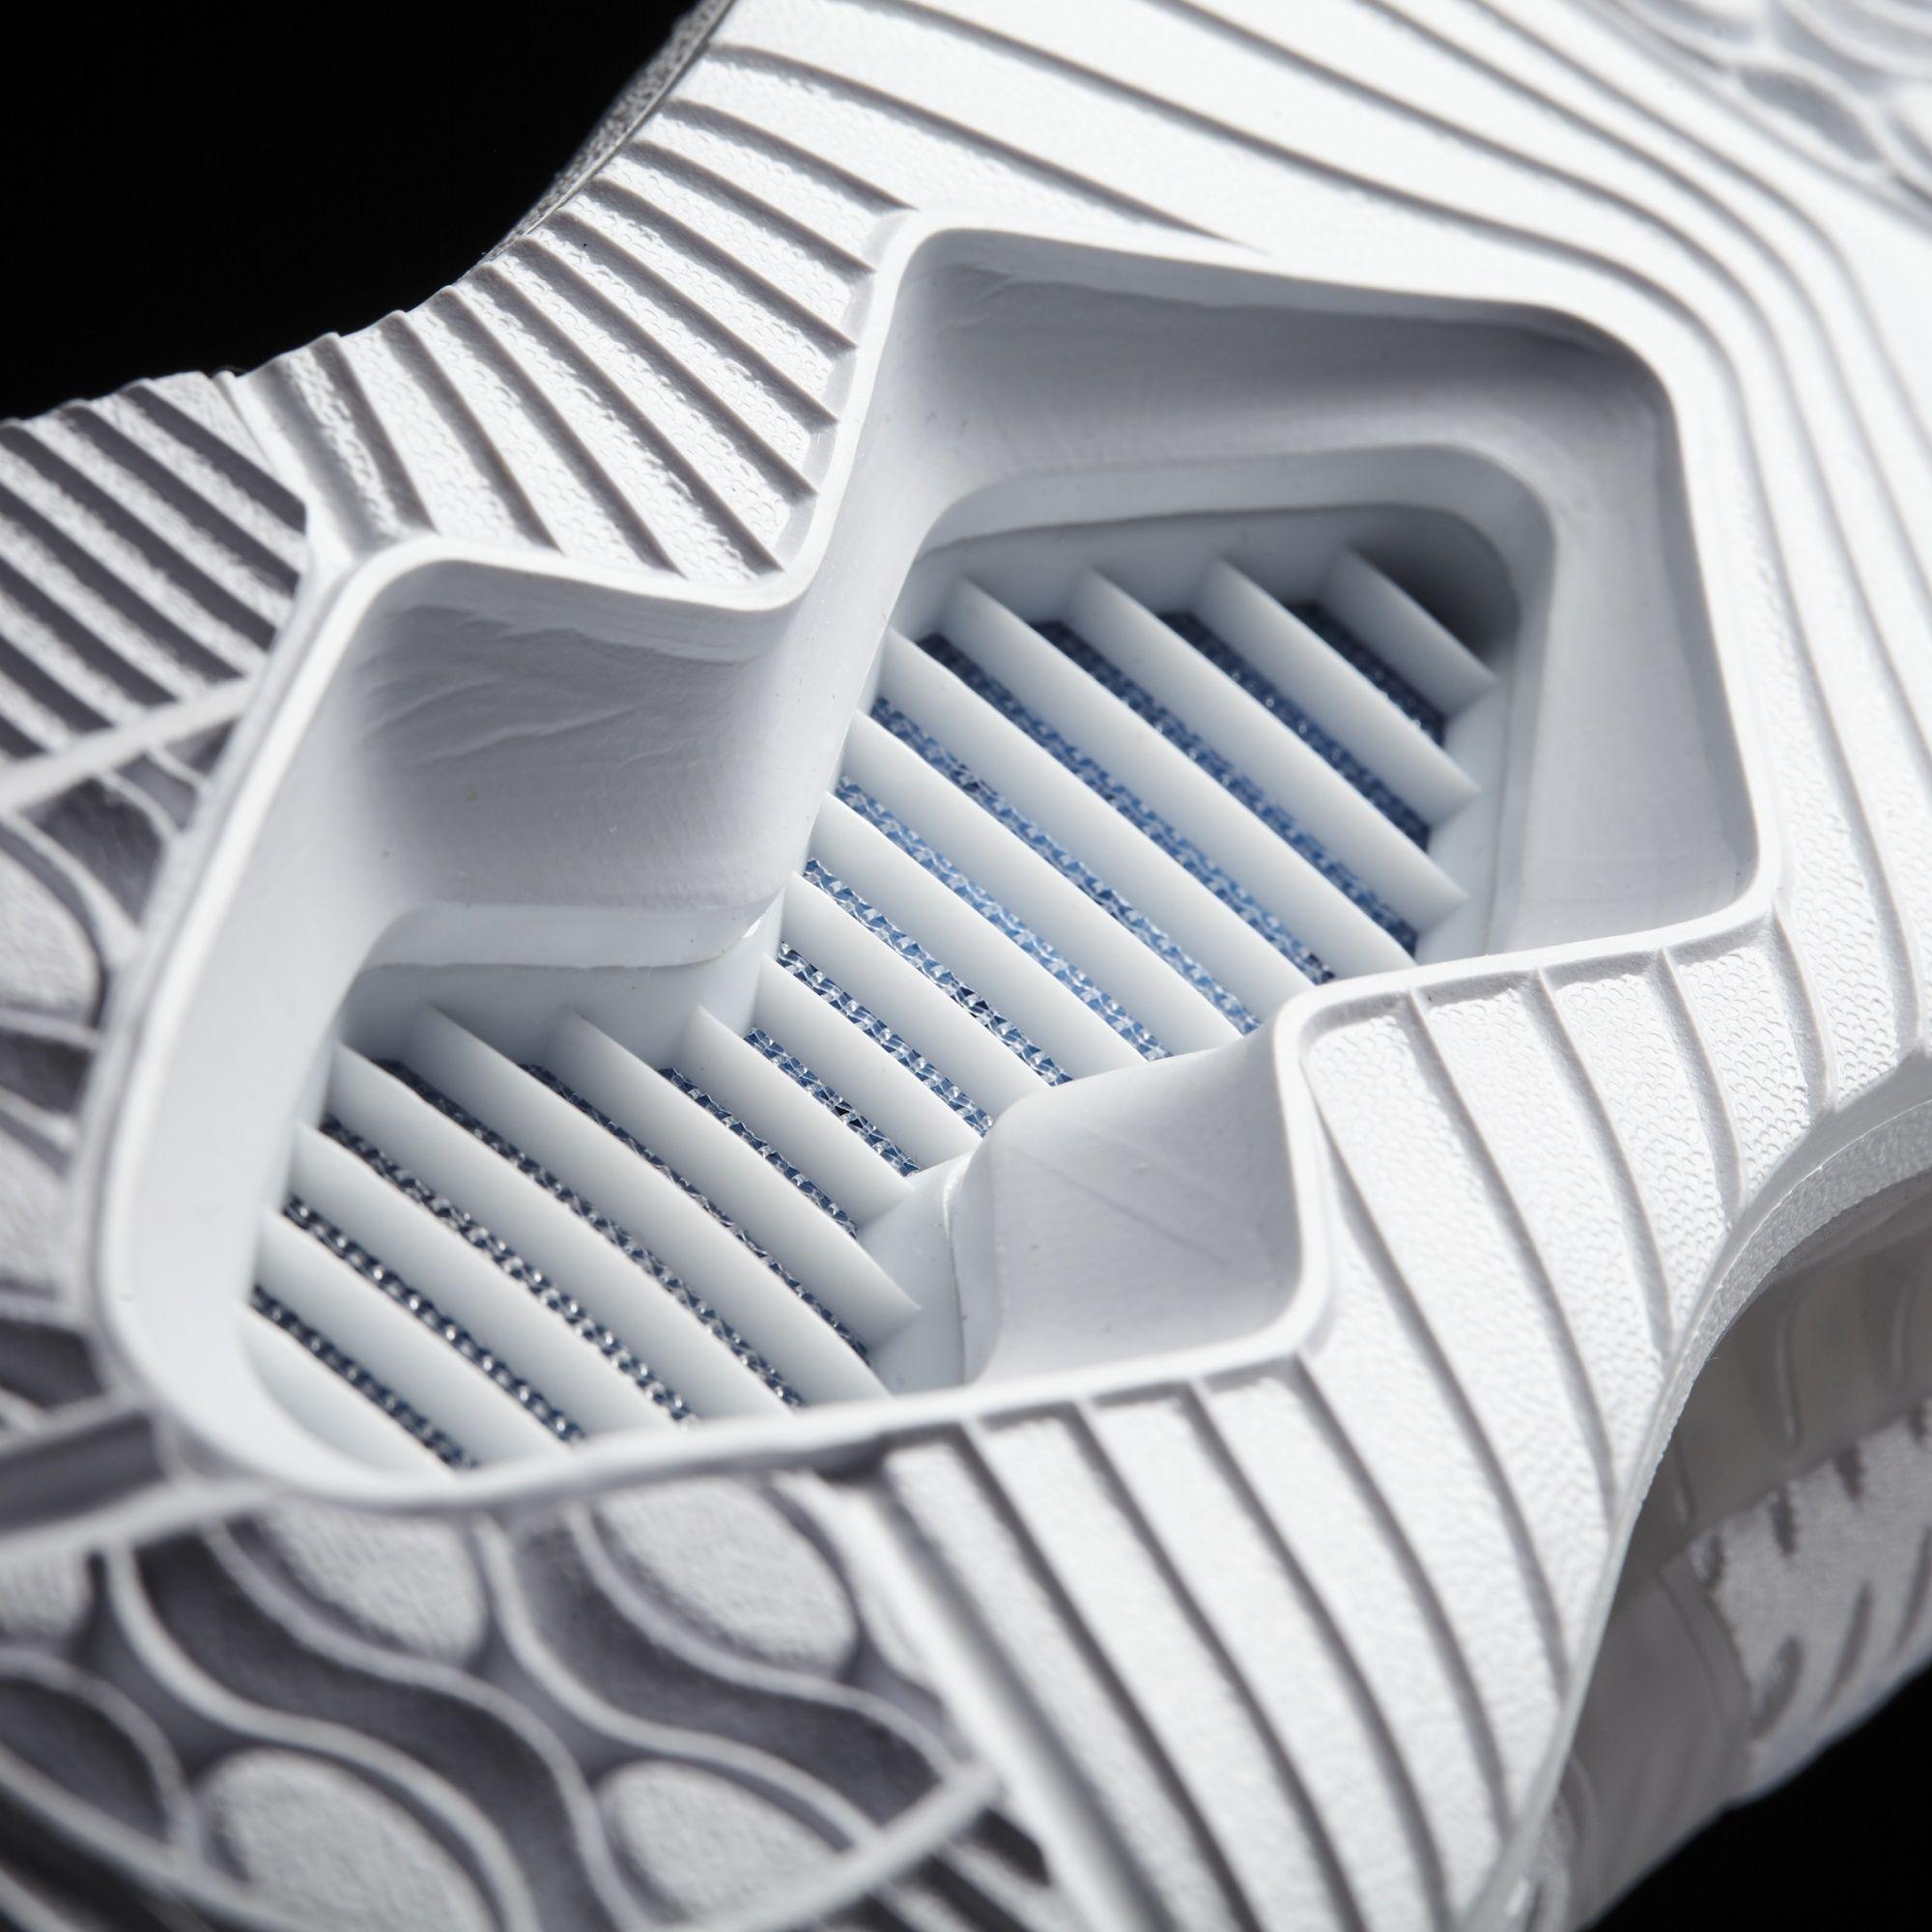 BZ0246 adidas Climacool 02.17 White Grey 5